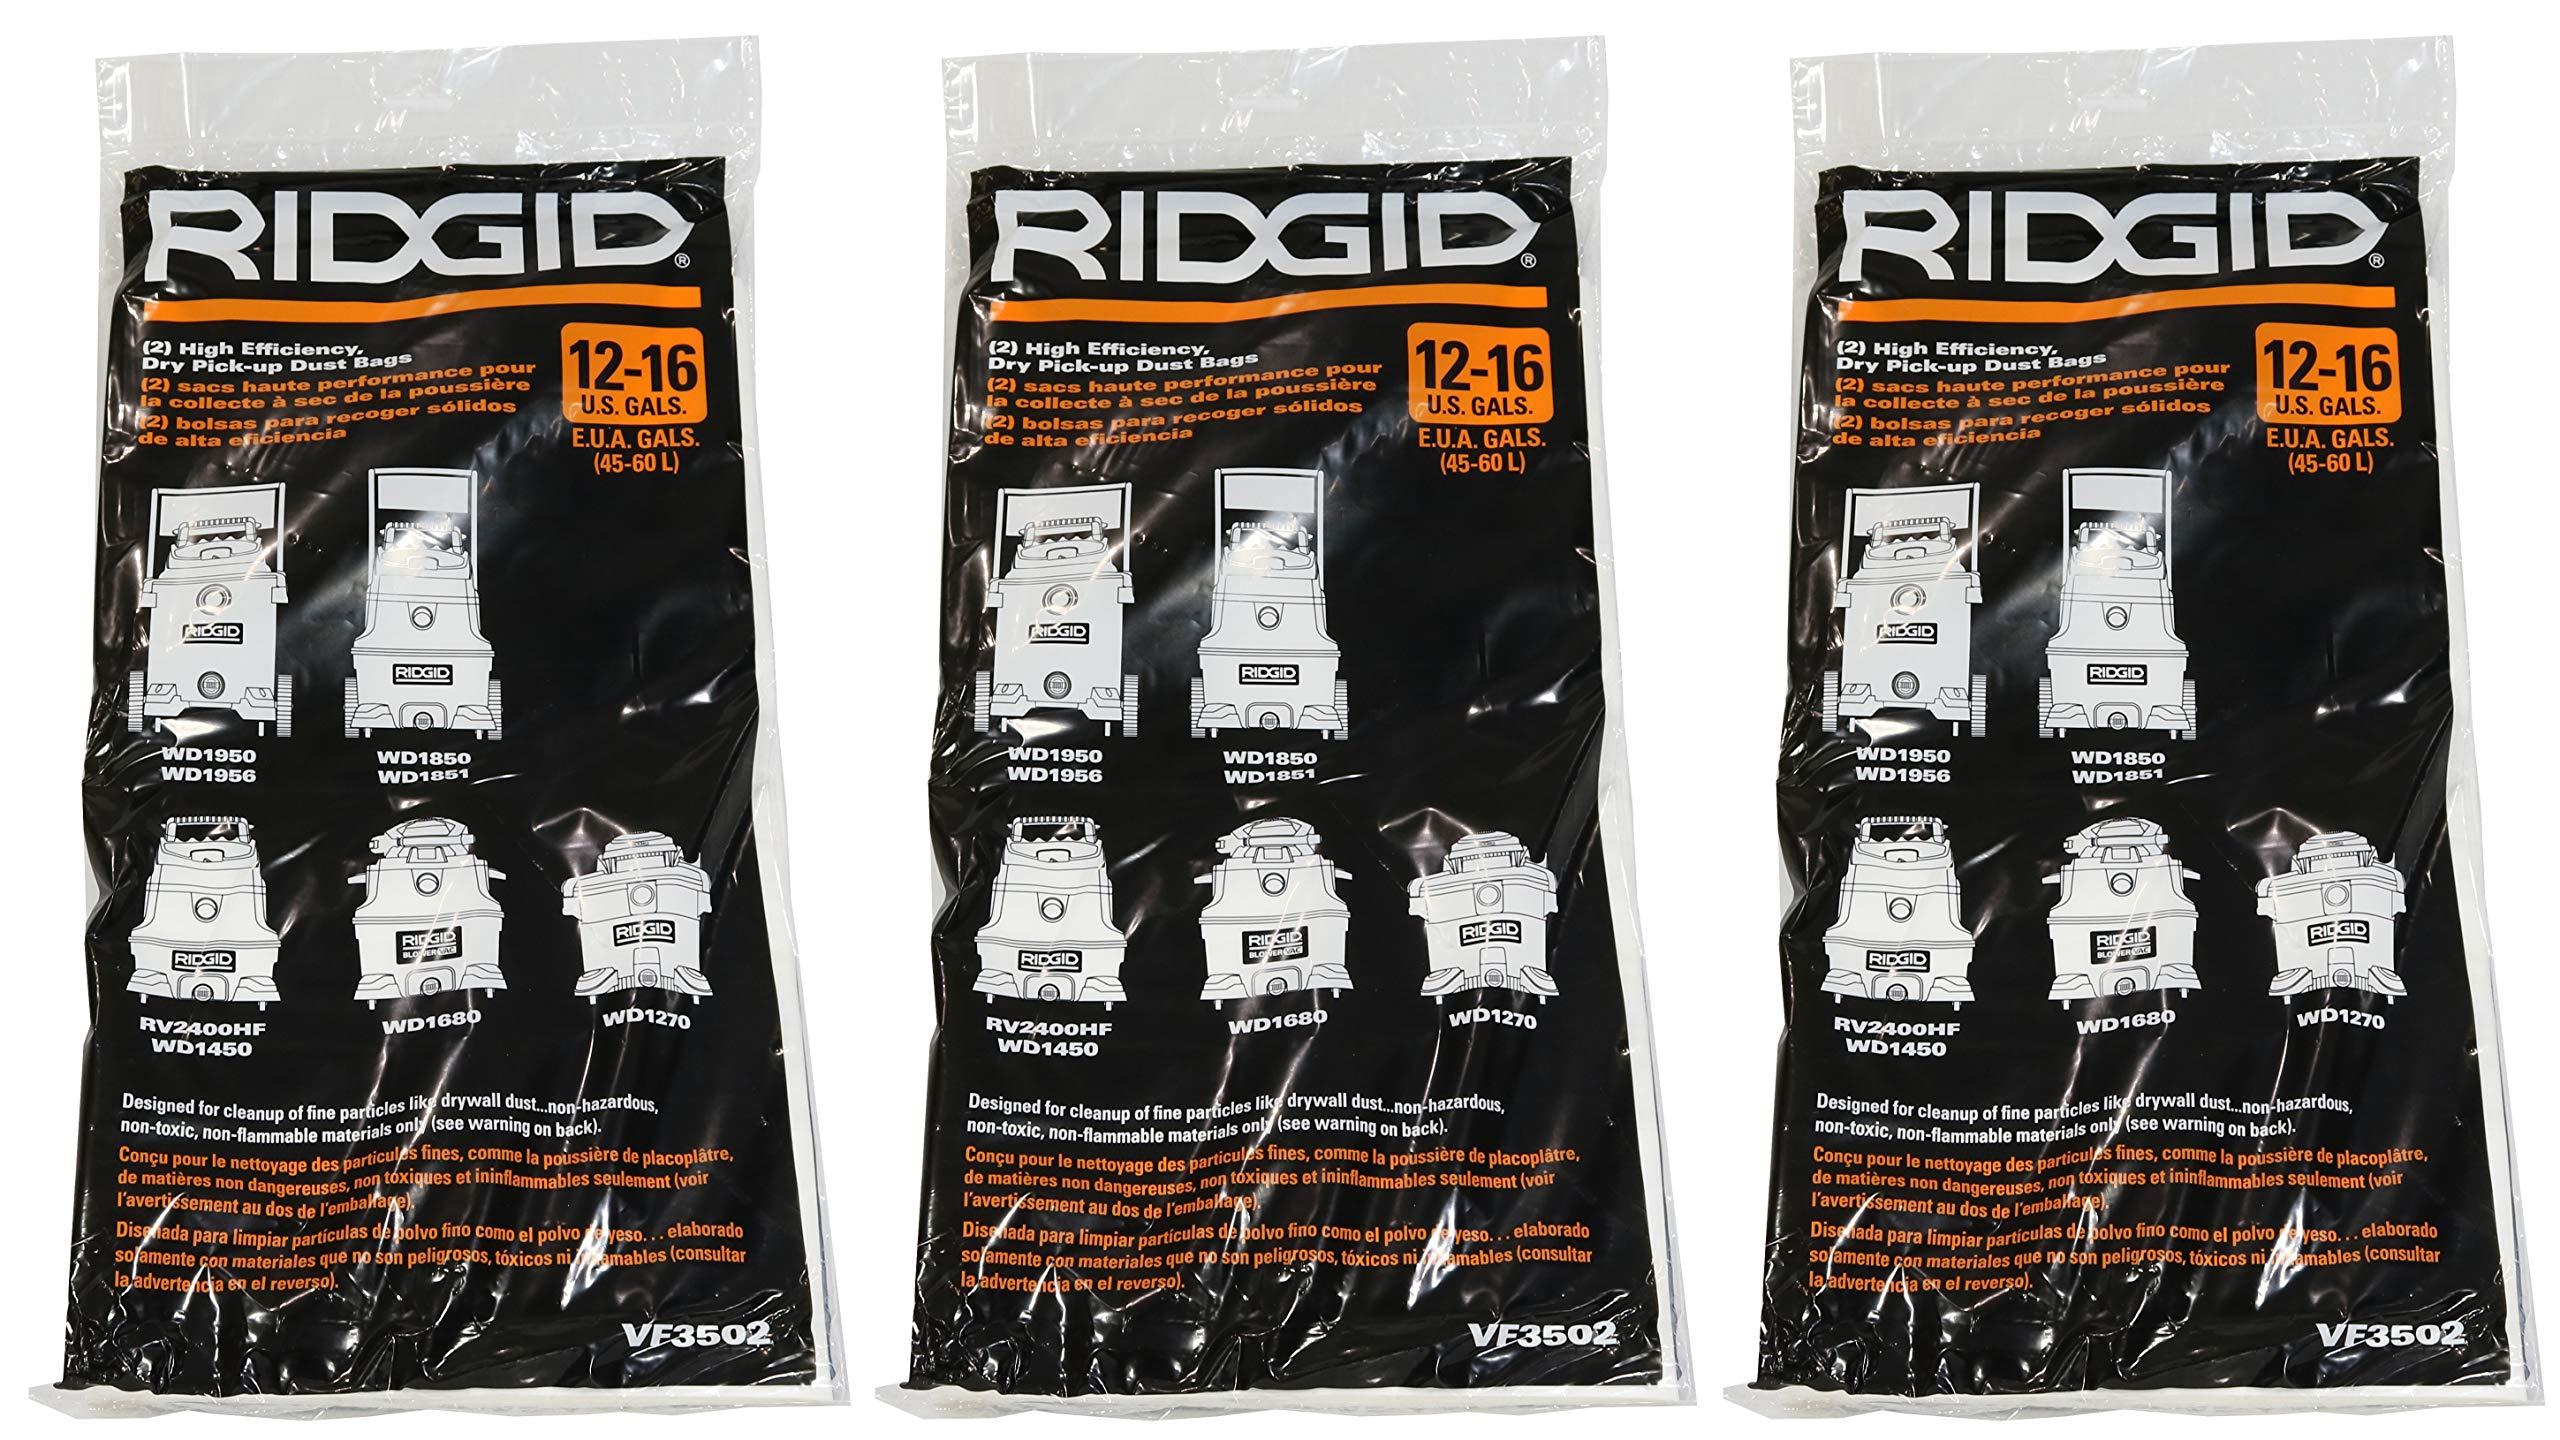 Ridgid VF3502 High Efficiency, Dry Pickup Dust Bags for 12 - 16 Gallon Ridgid Wet / Dry Vacuums (3 X Pack of 2)